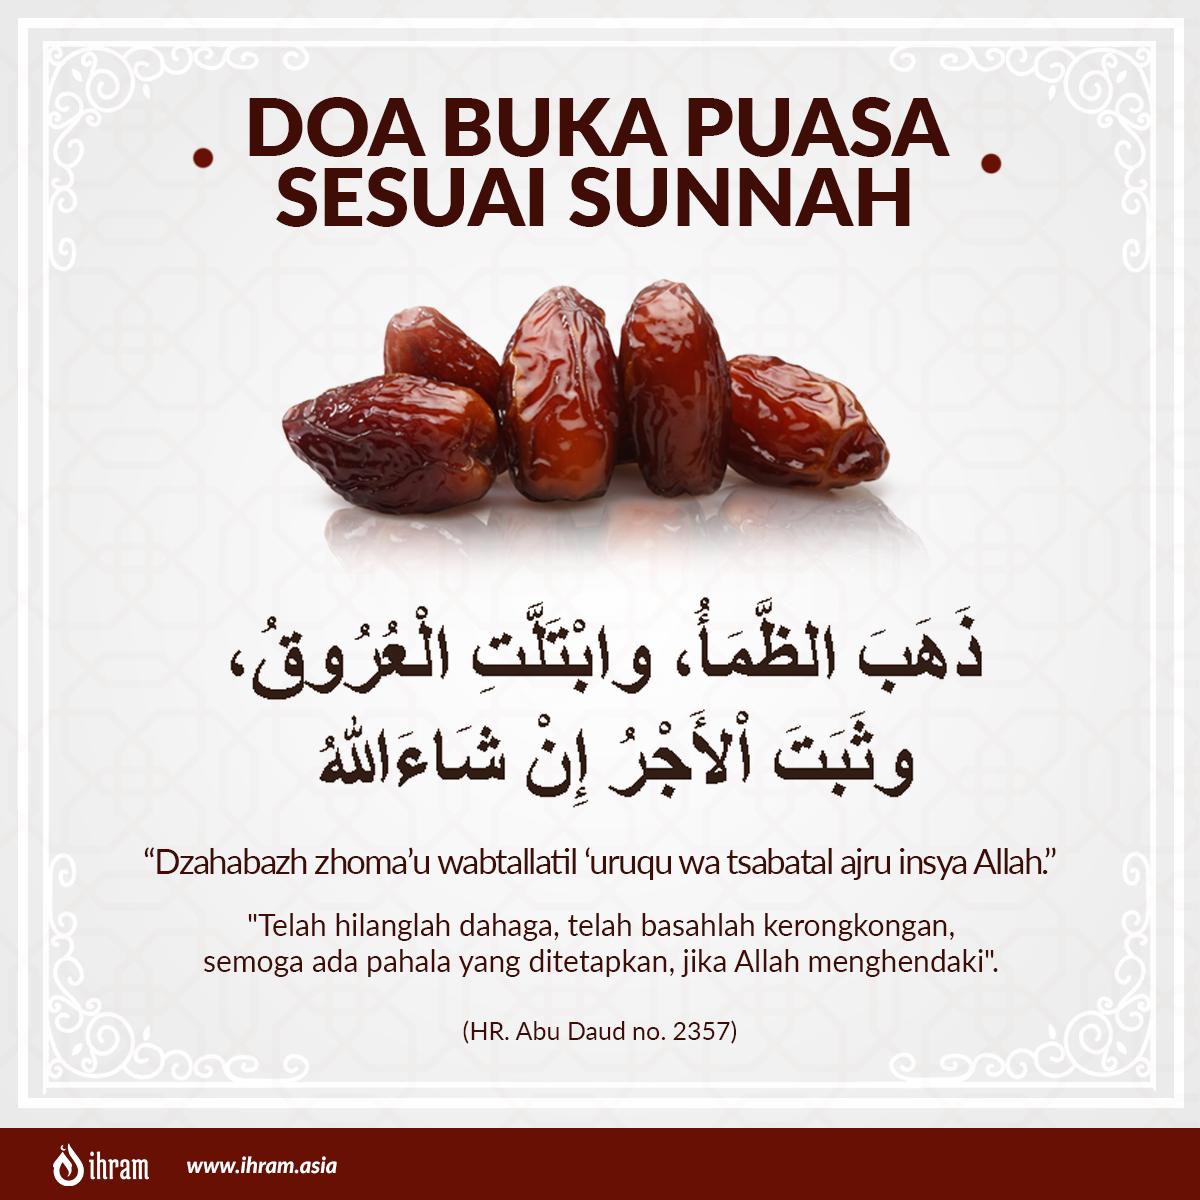 Doa Buka Puasa Sesuai Sunnah Ihram Asia